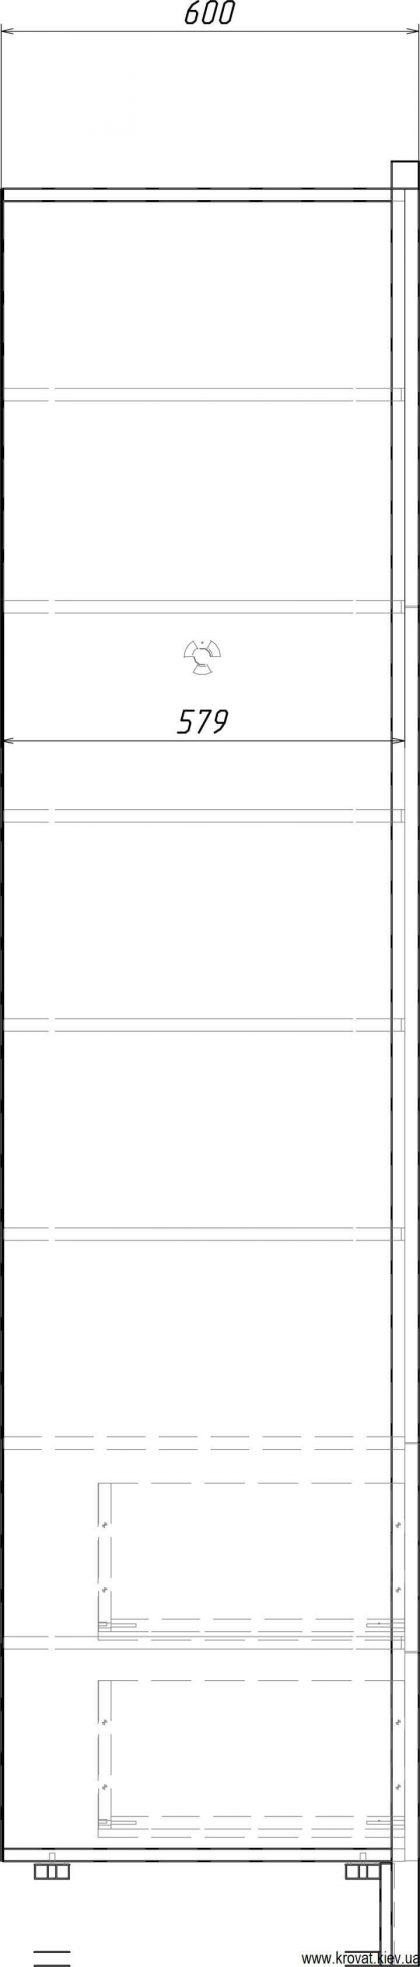 чертеж шпонированного шкафа с размерами